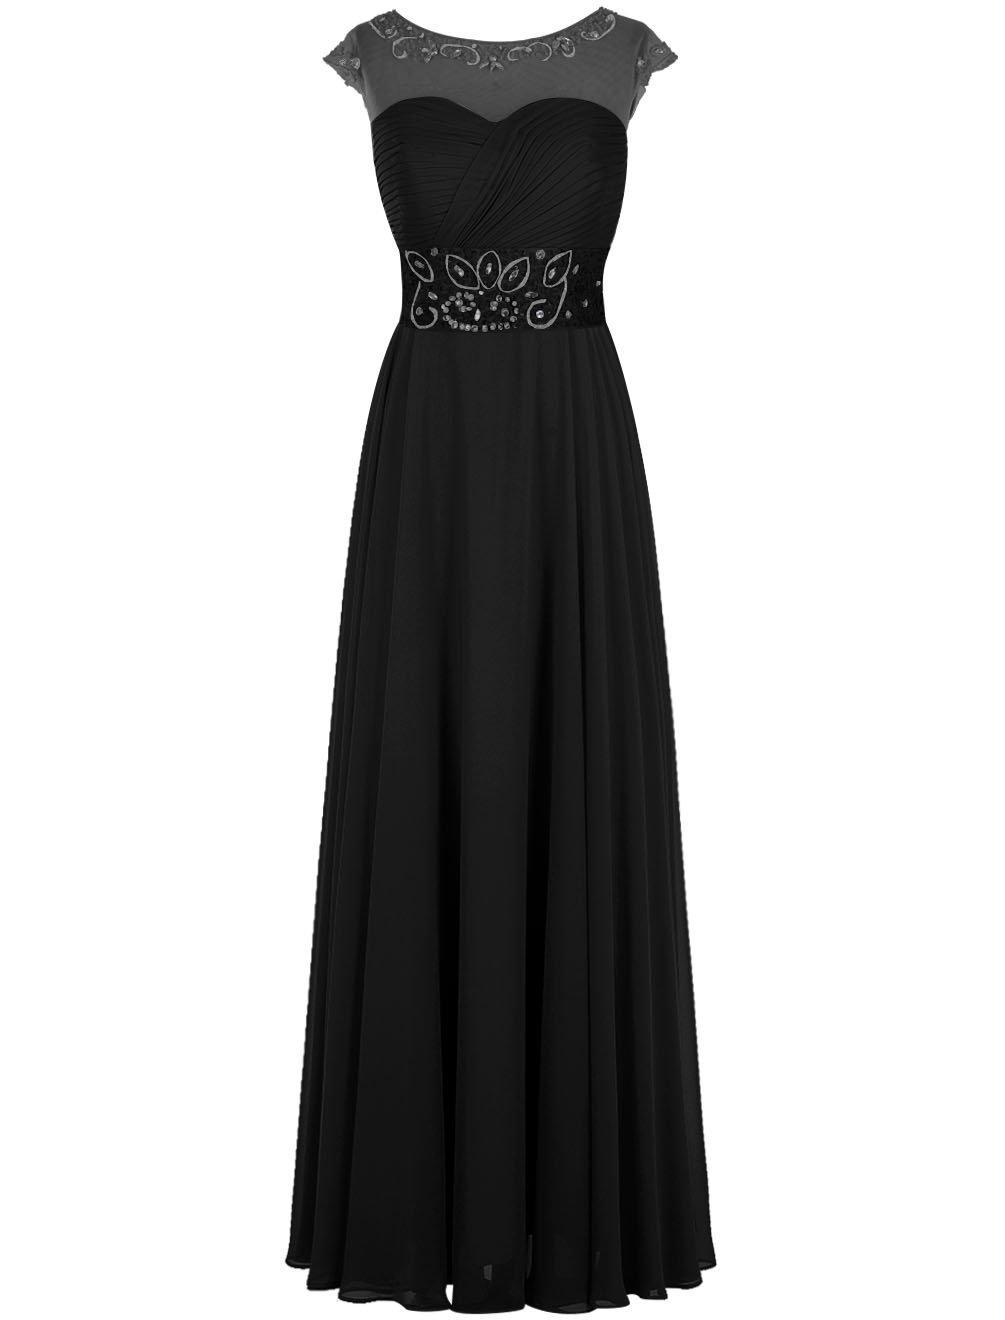 Dresstell(ドレステル) 結婚式 フォーマルドレス ビジュー付き キャップ袖 ロング丈 レディース B019MSPCW6 JP19W|ブラック ブラック JP19W